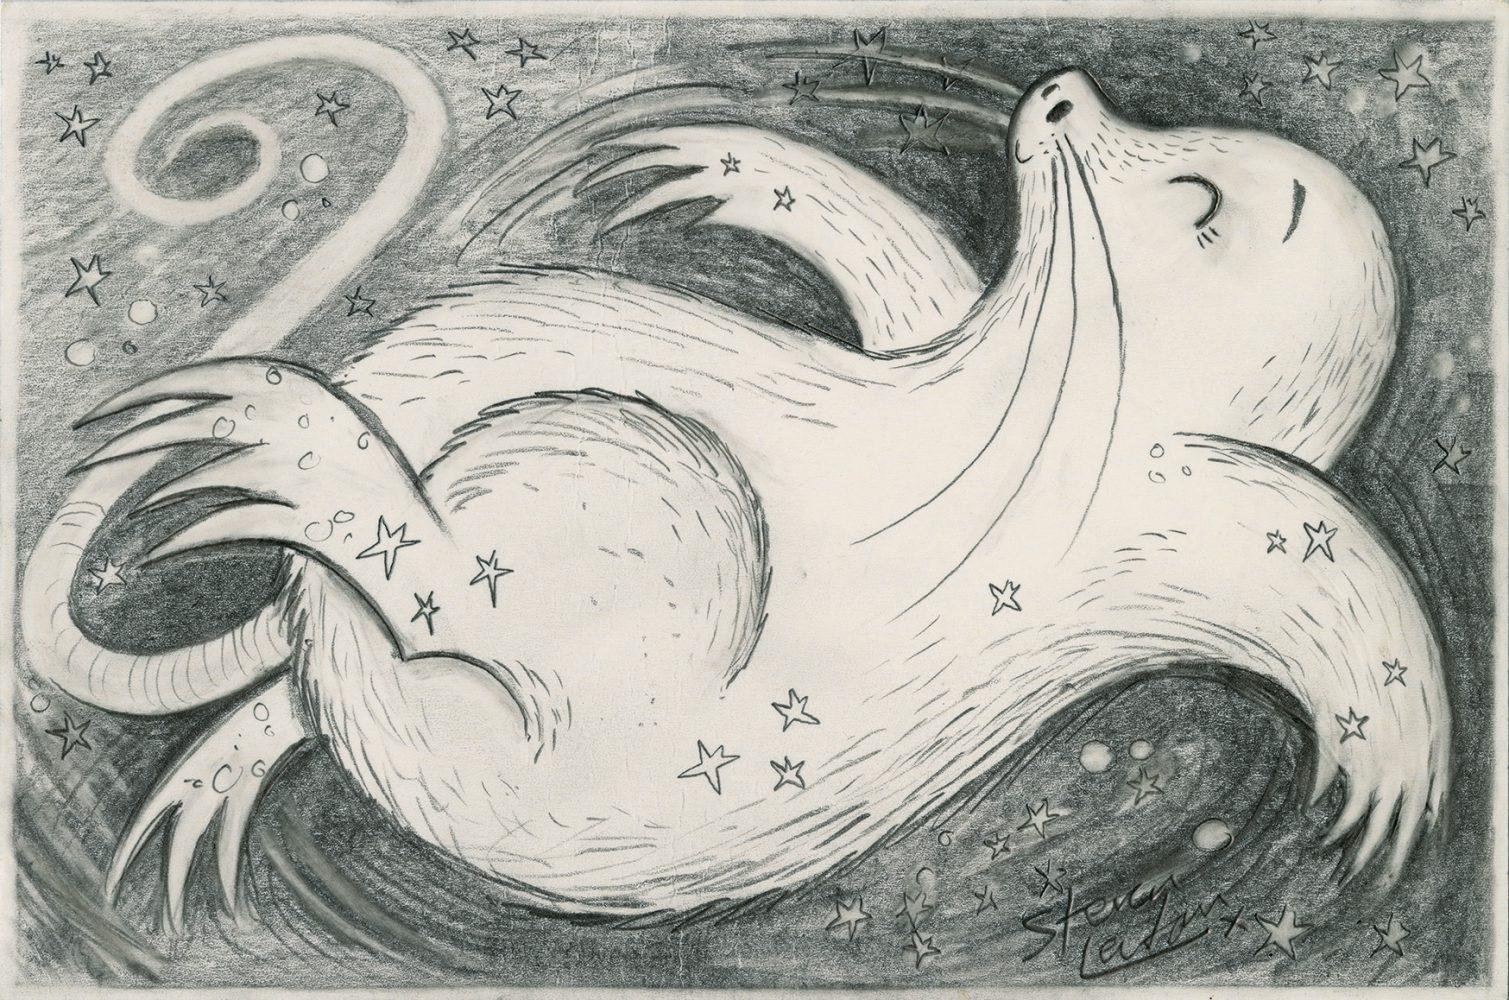 Mole – Steven Lenton